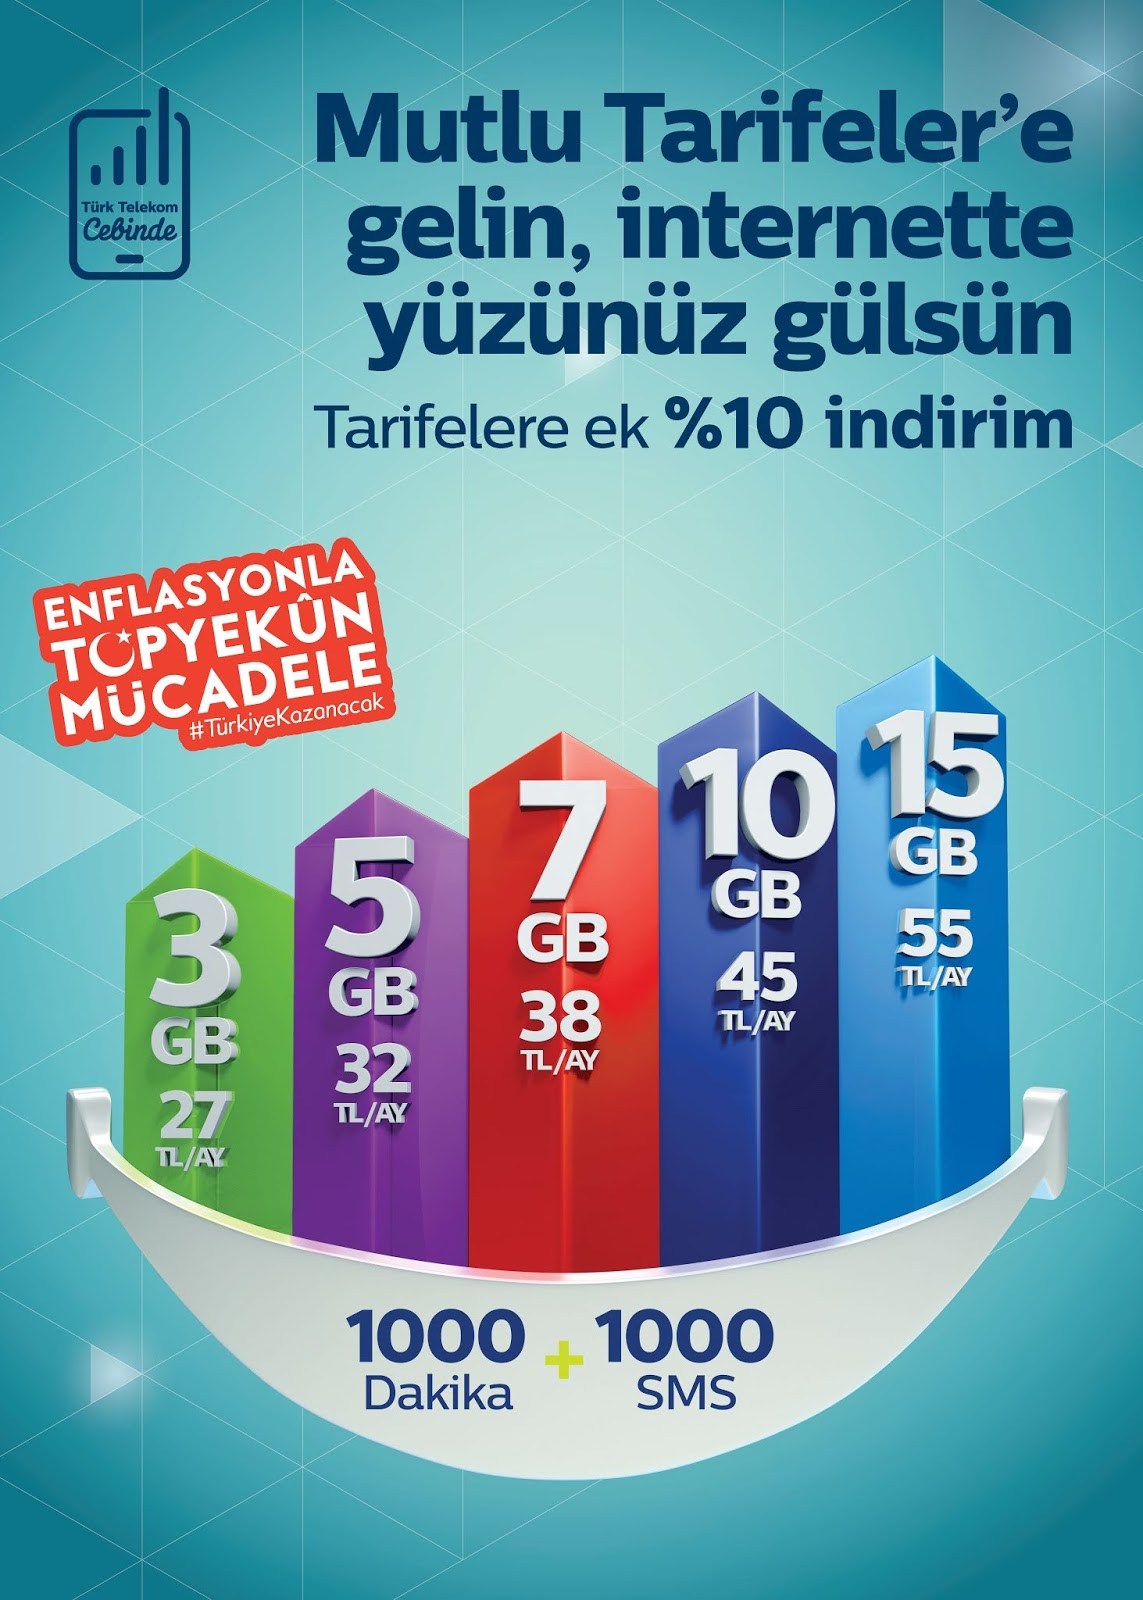 Türk telekom indirim